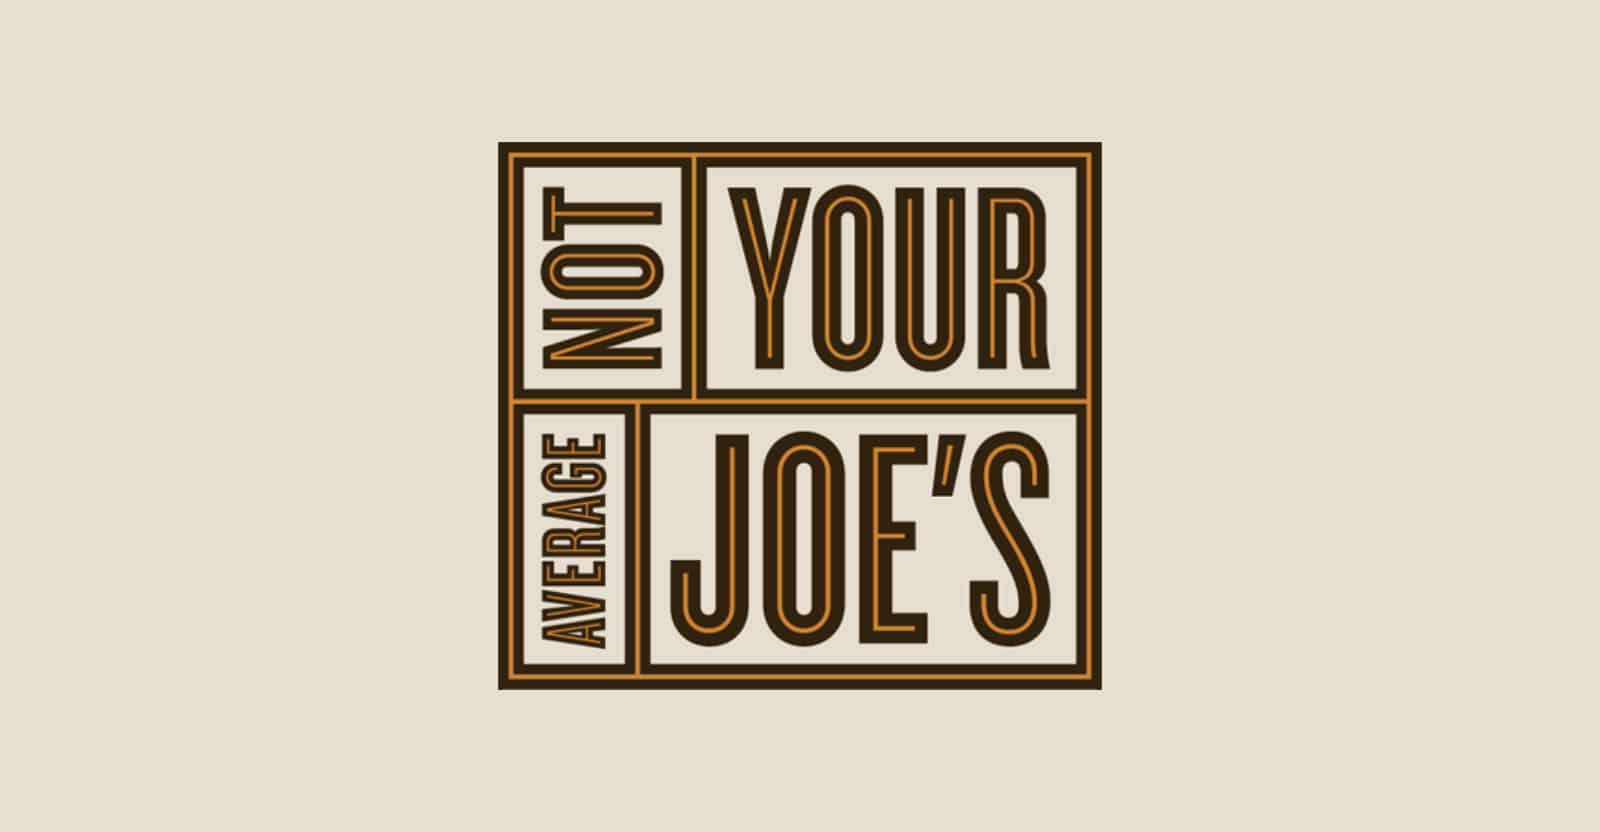 Not Your Average Joe's Gluten-Free Menu